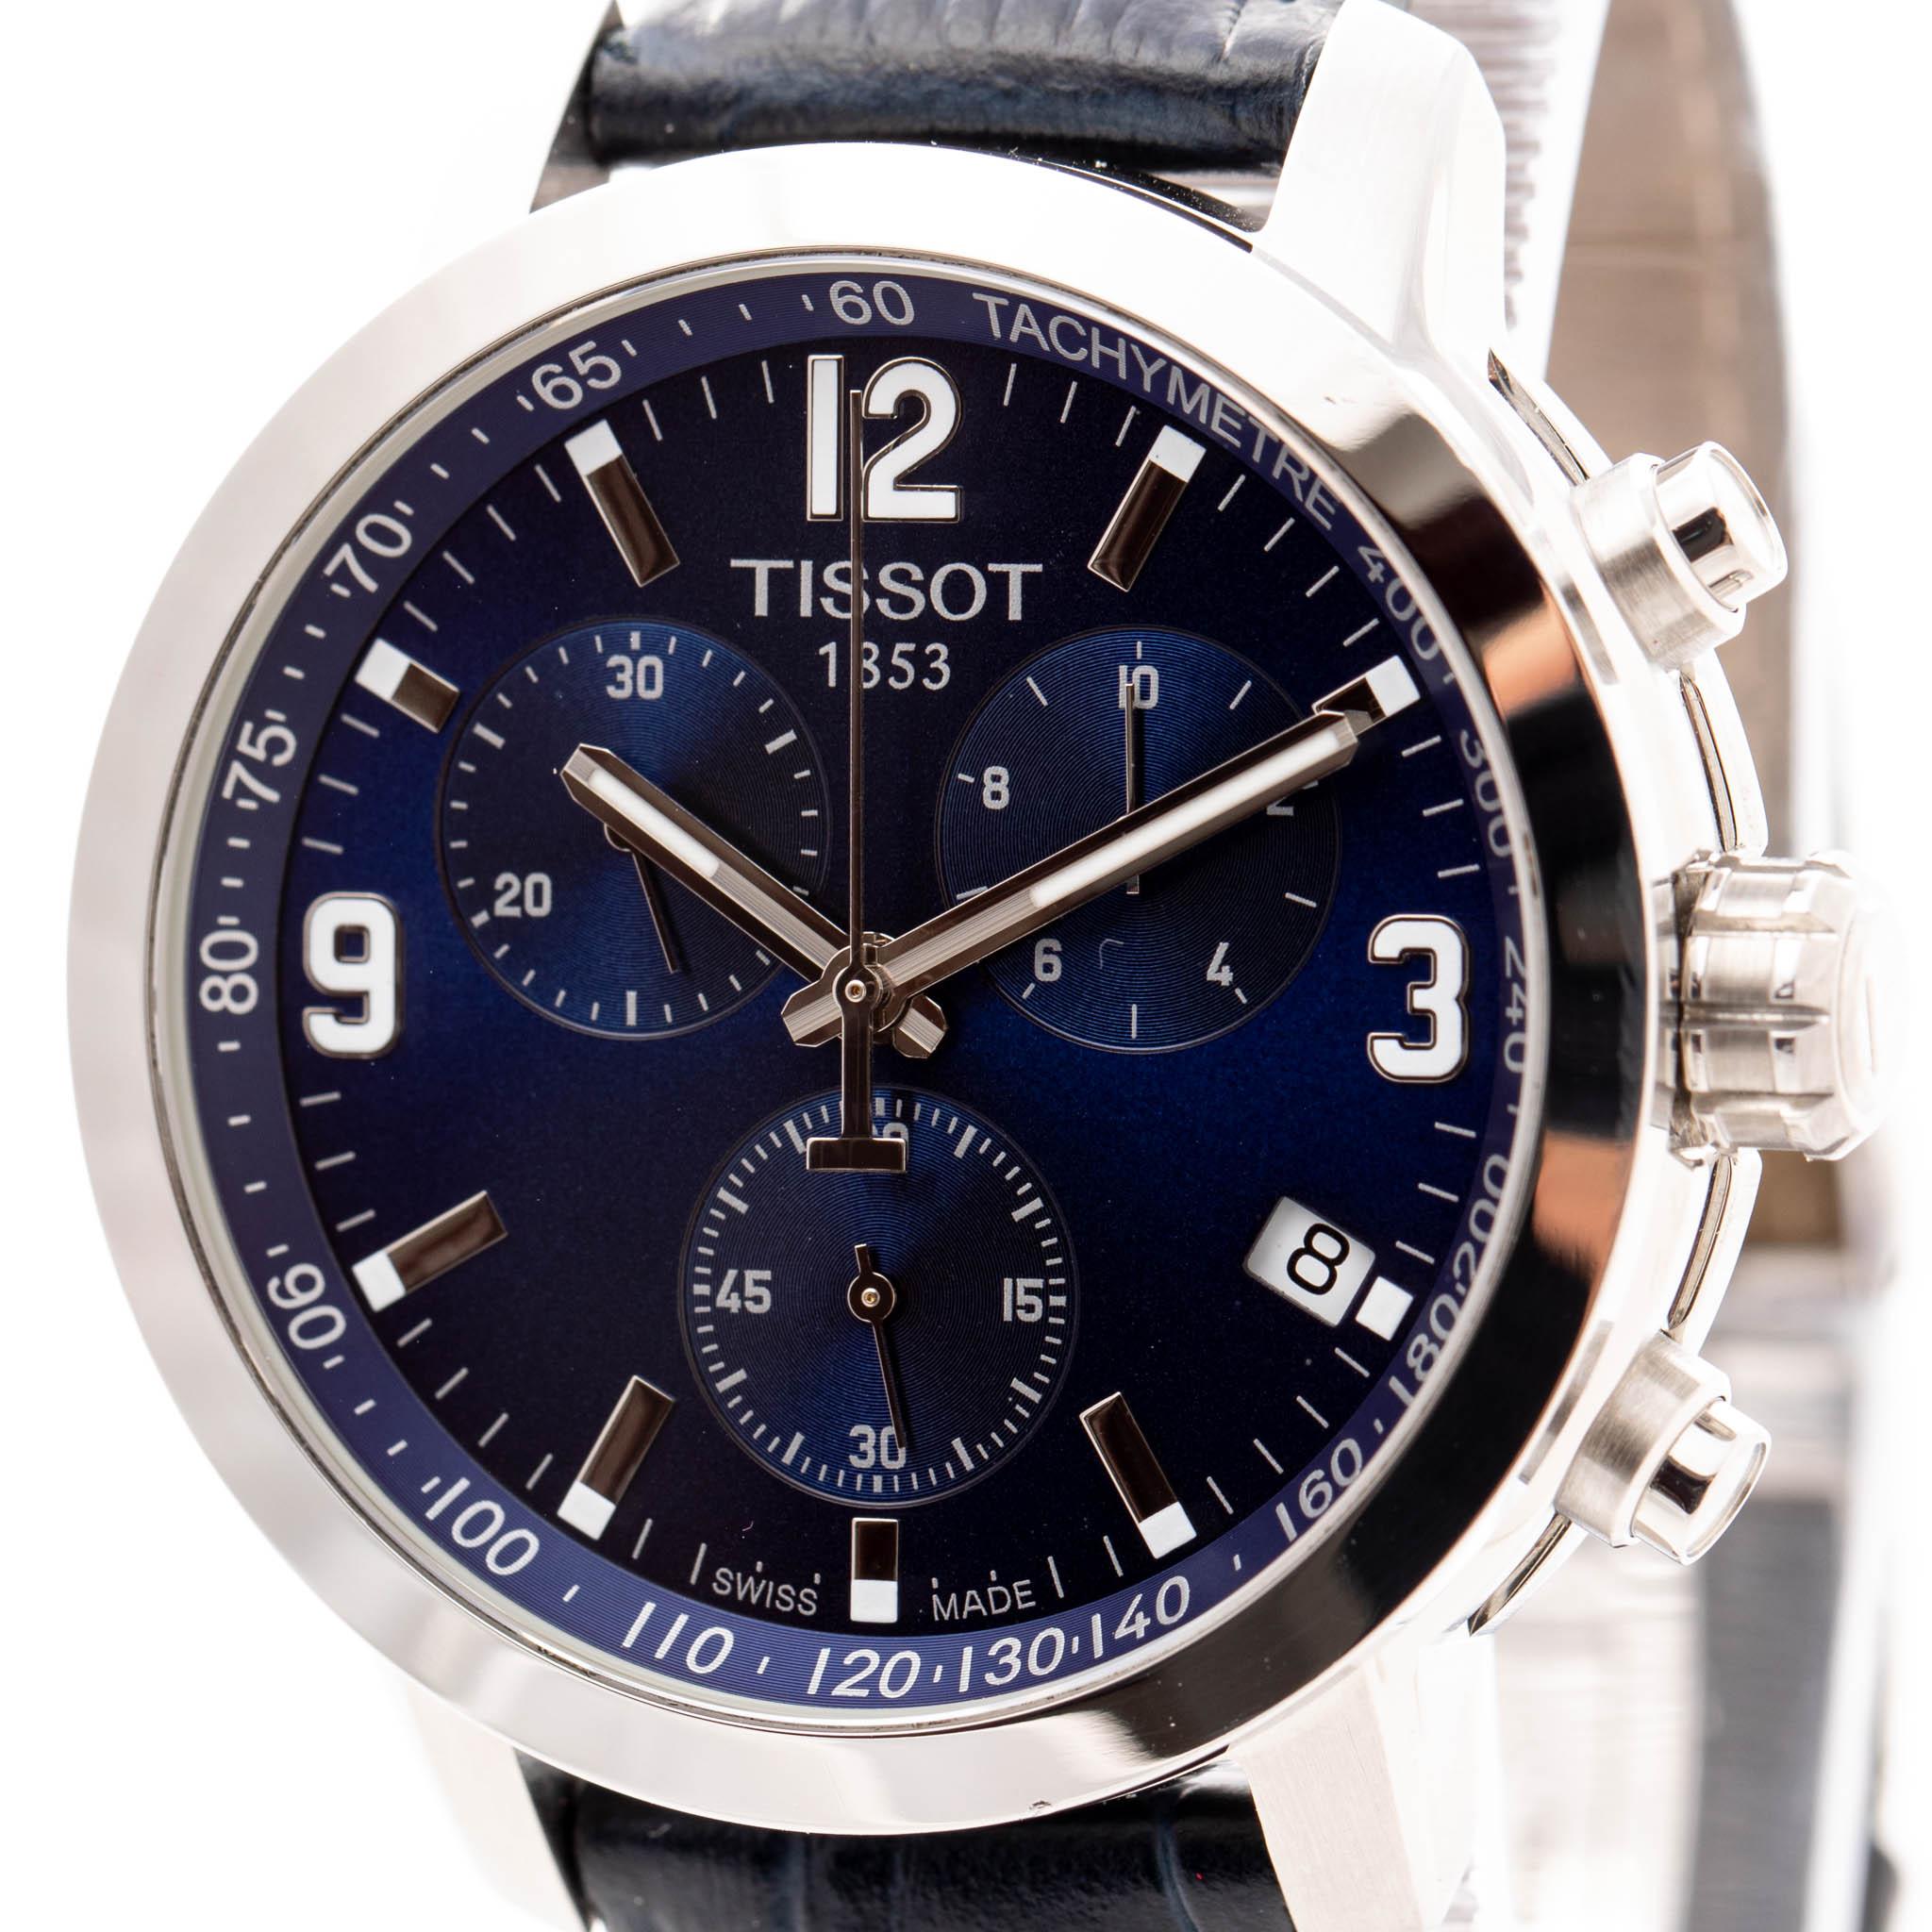 TISSOT PRC 200 42MM CHRONOGRAPH STEEL BLUE DIAL REF: T055417